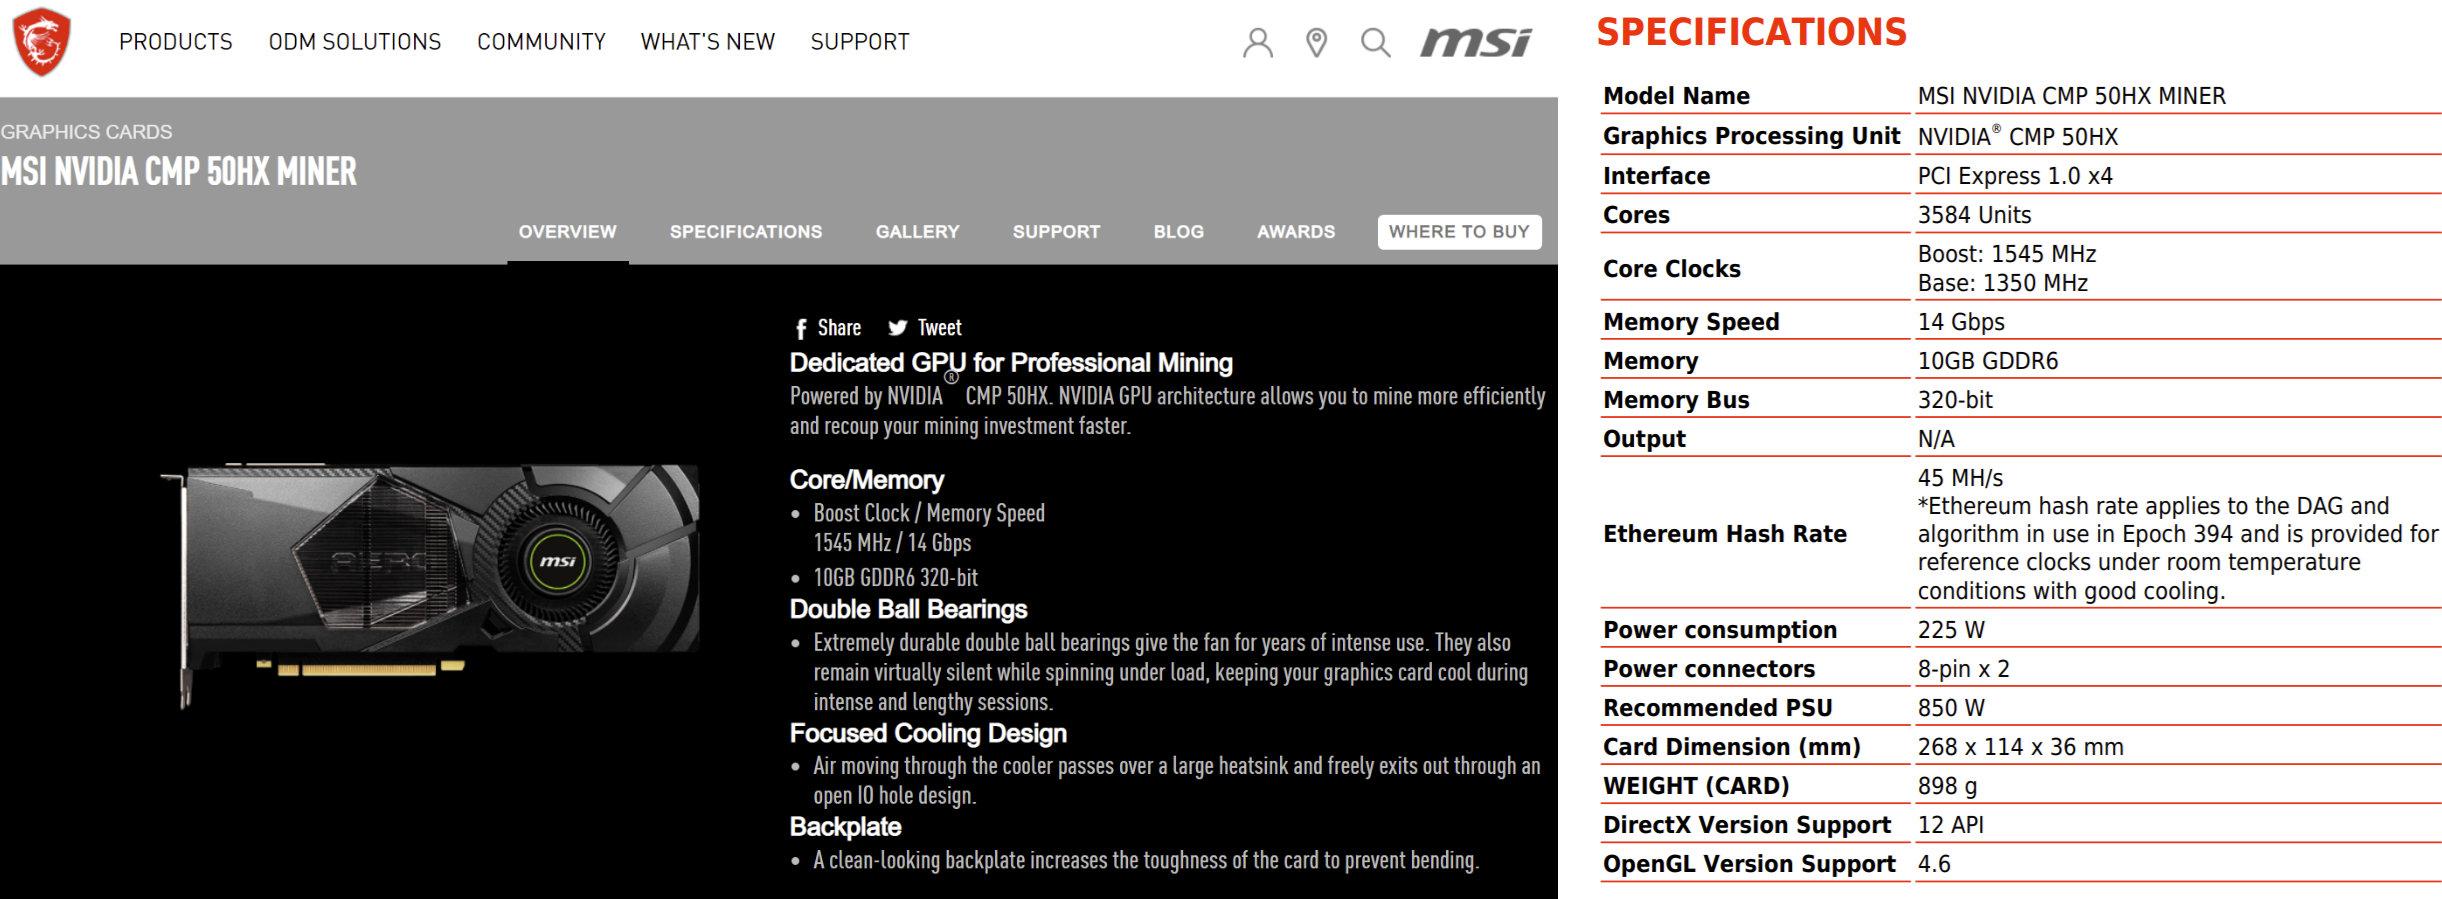 MSI-CMP-50HX-MINER.jpg